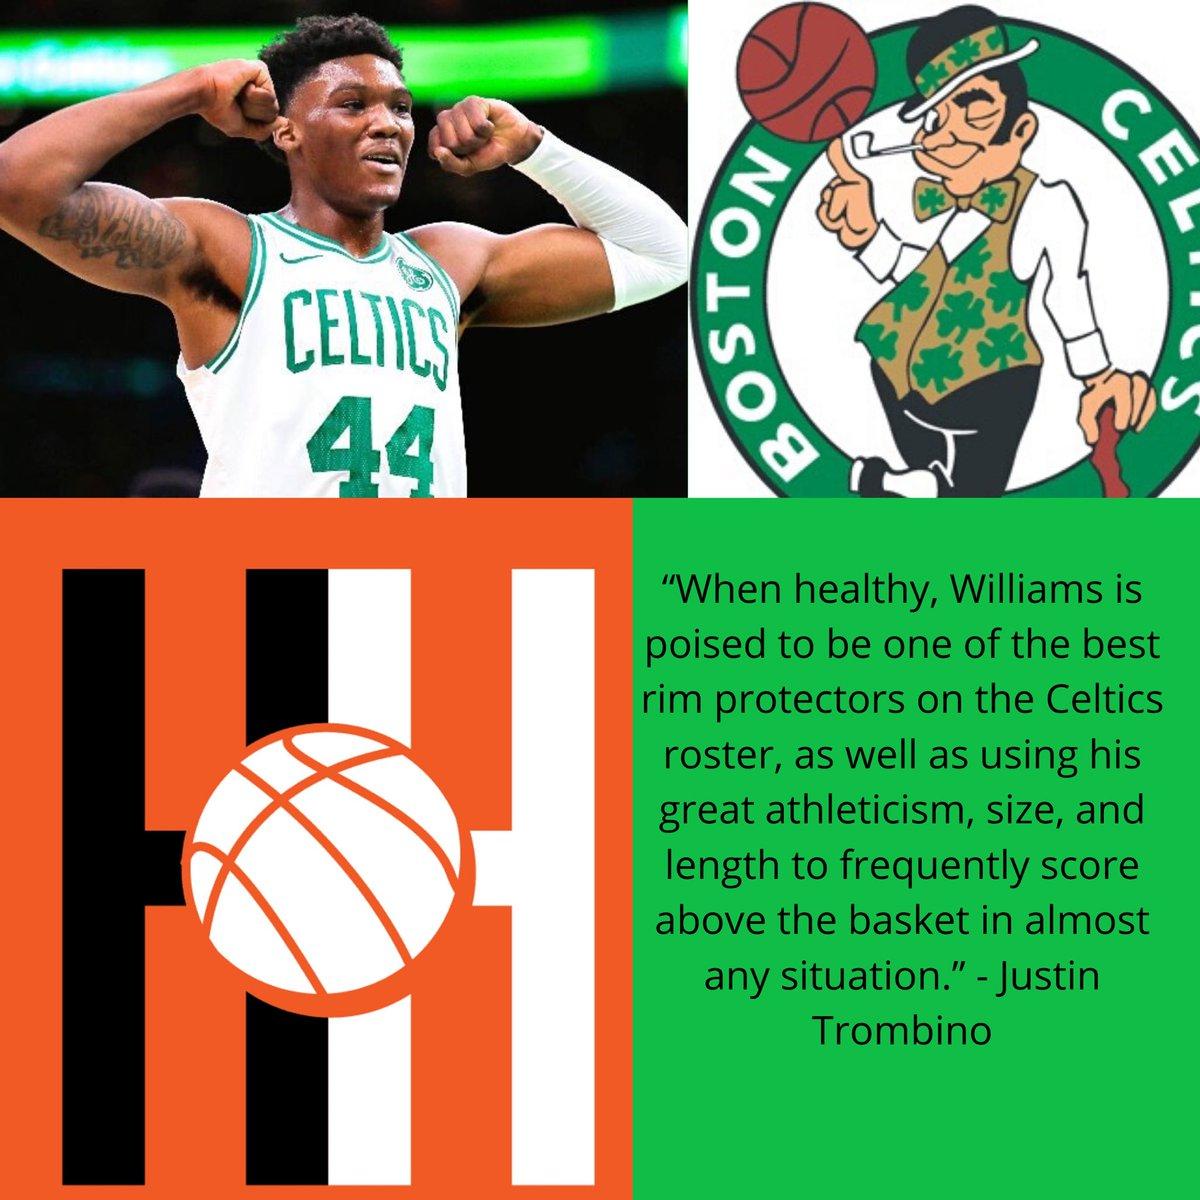 New #Celtics Article   Link in comments  #Celtics #NBApic.twitter.com/zDPLdL13mF